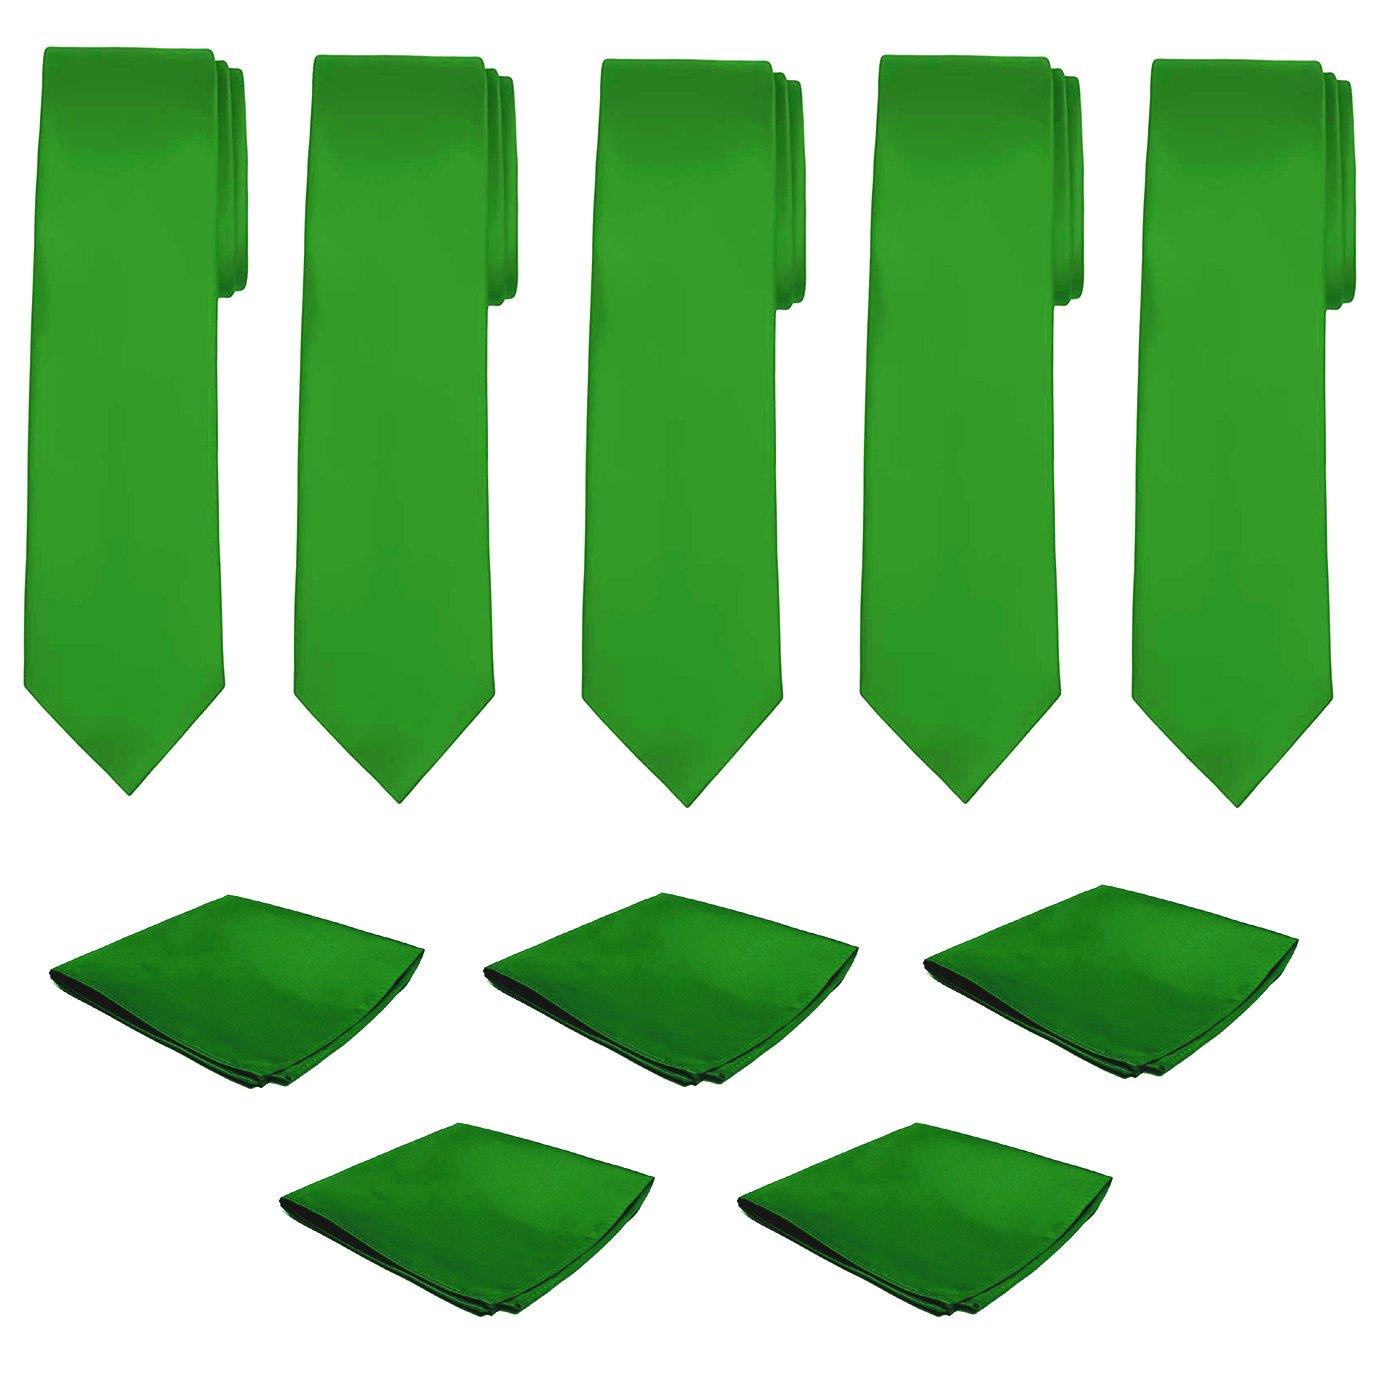 Mens Necktie Pocket Square 10 Pcs Set Solid Color Tie and Handkerchief for Wedding (Kelly Green)